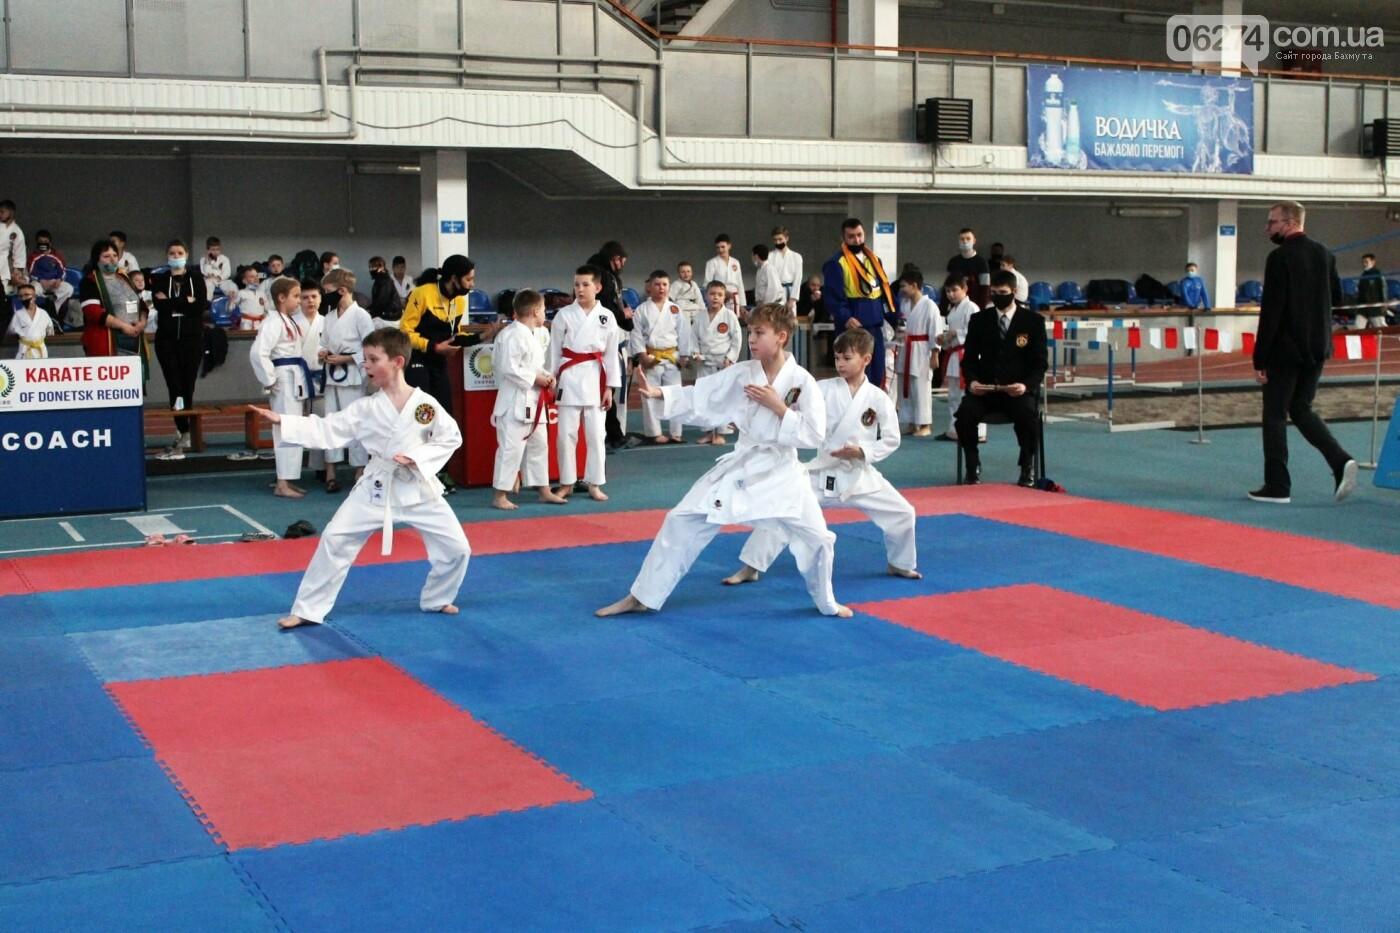 Бахмут гостеприимно принимал чемпионат Донецкой области по каратэ, фото-2